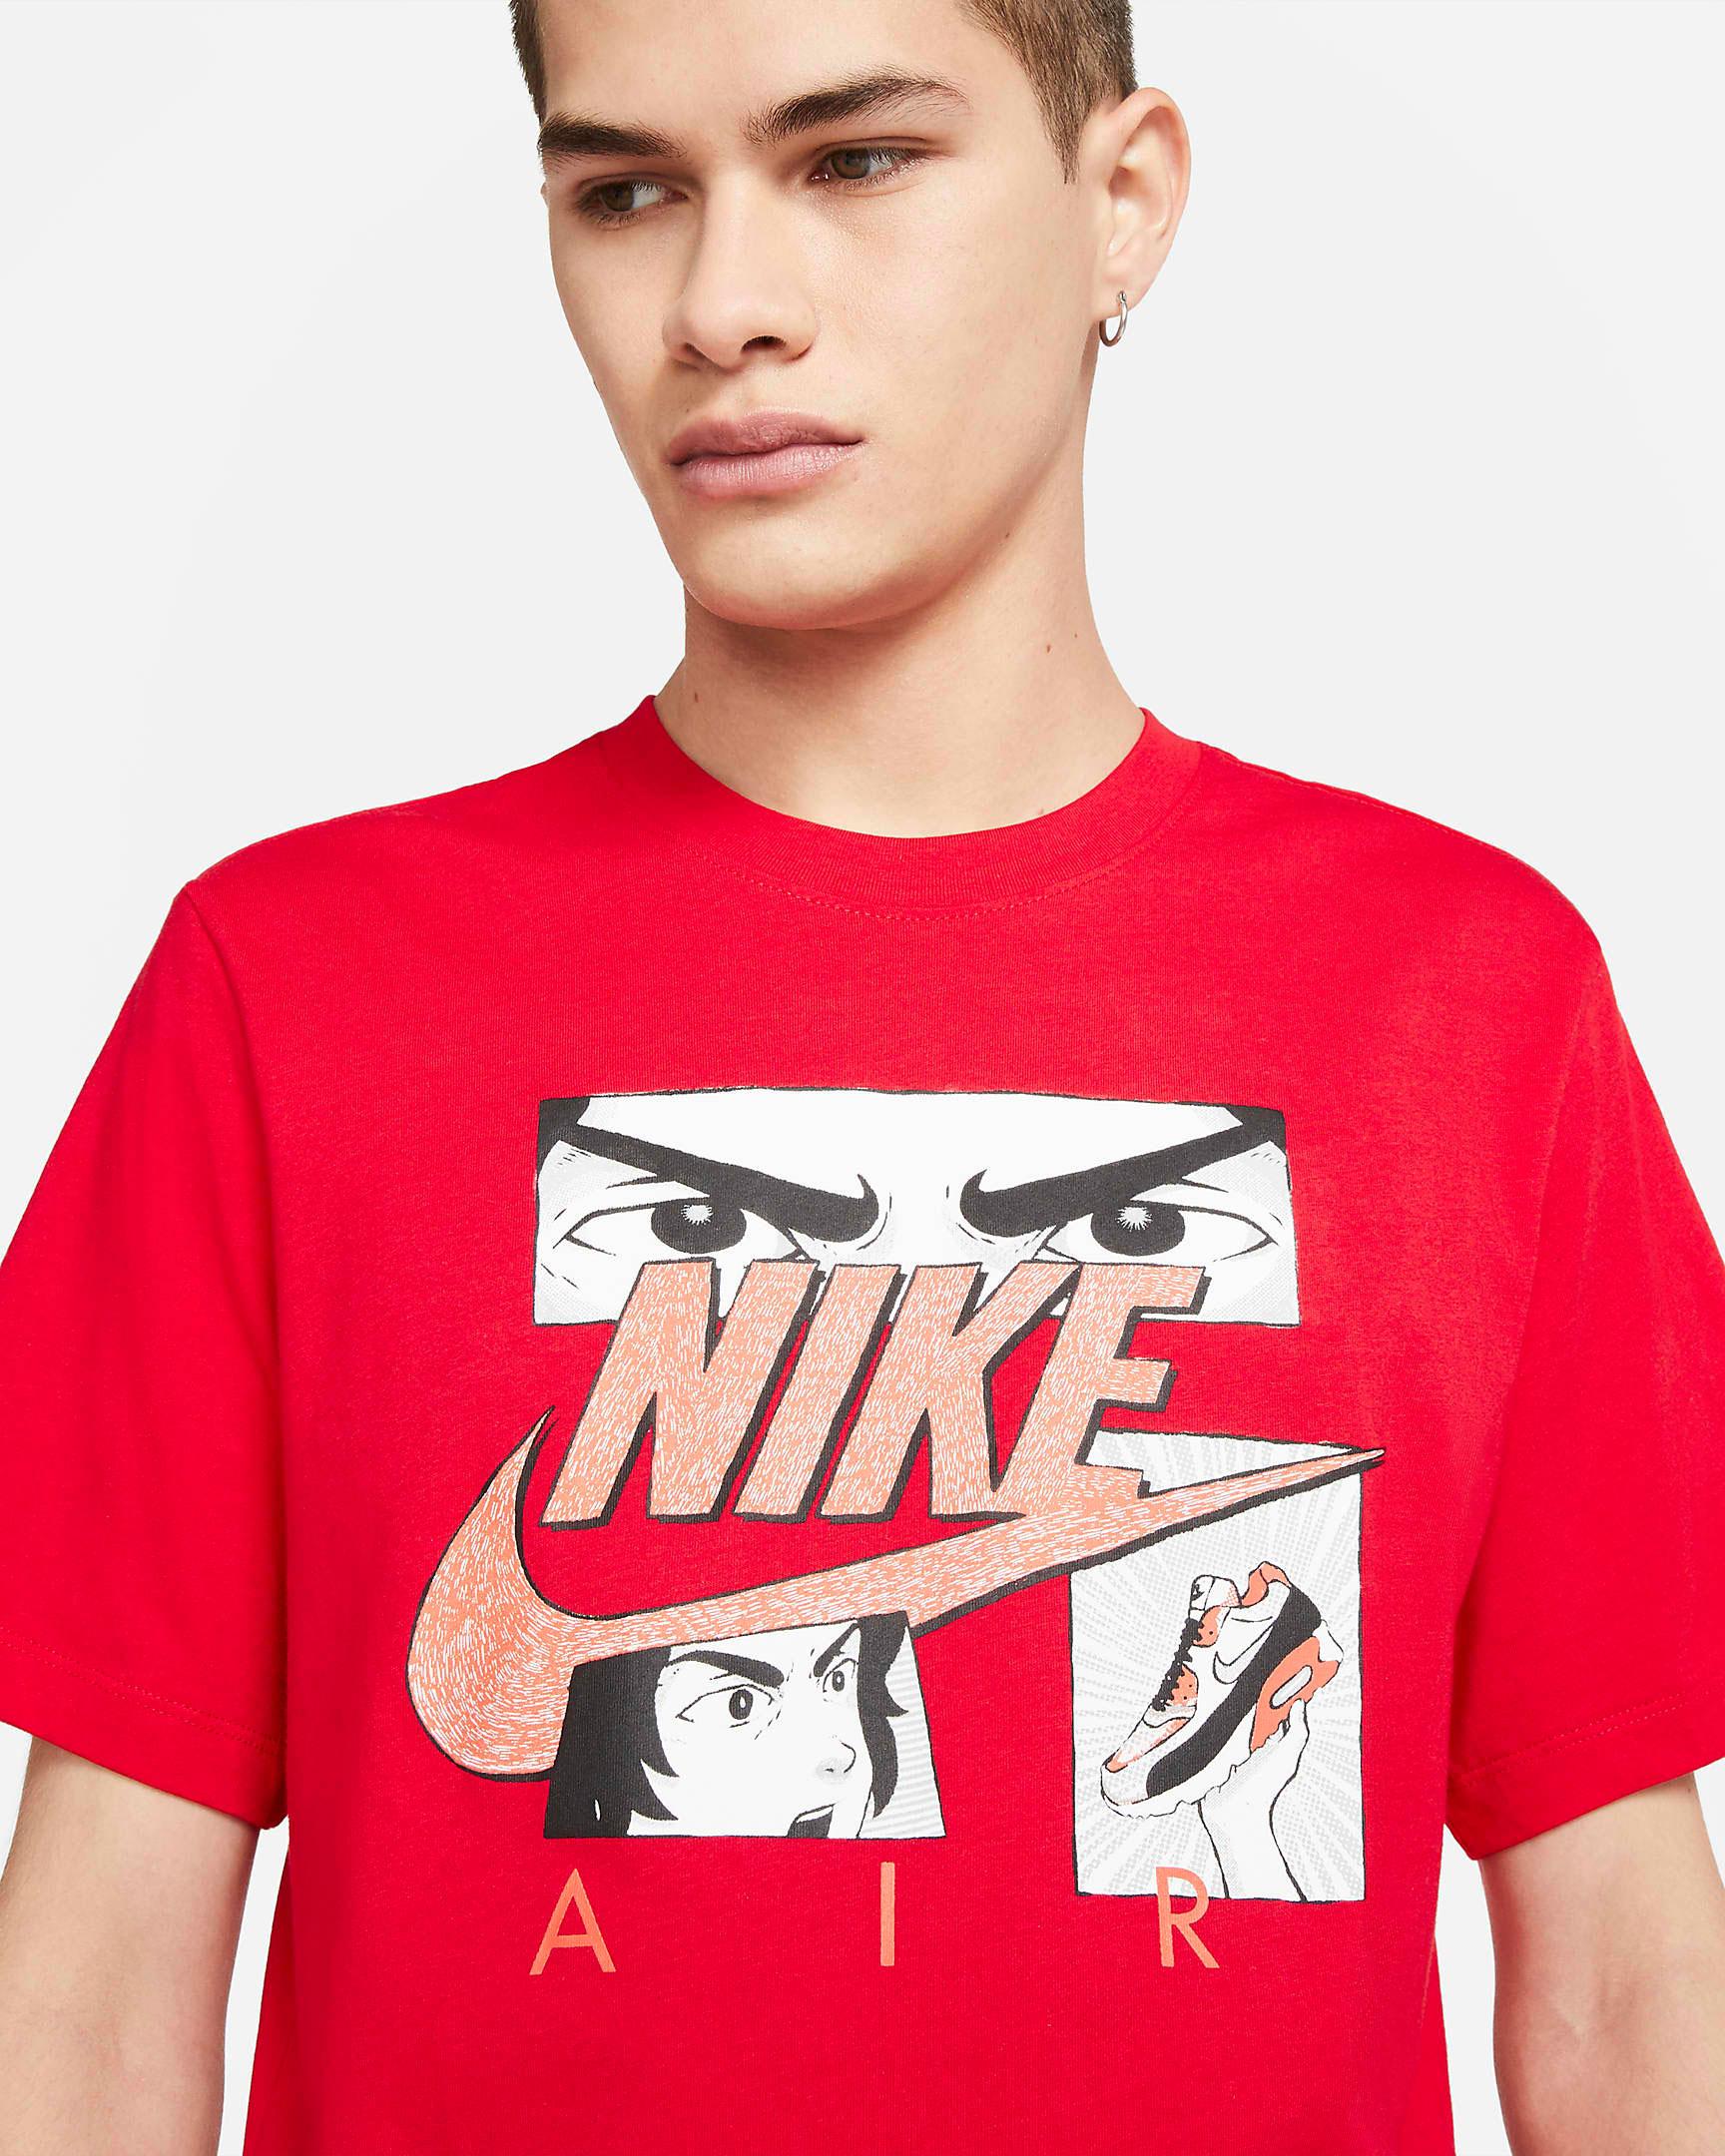 nike-air-max-90-infrared-radiant-red-manga-shirt-red-1